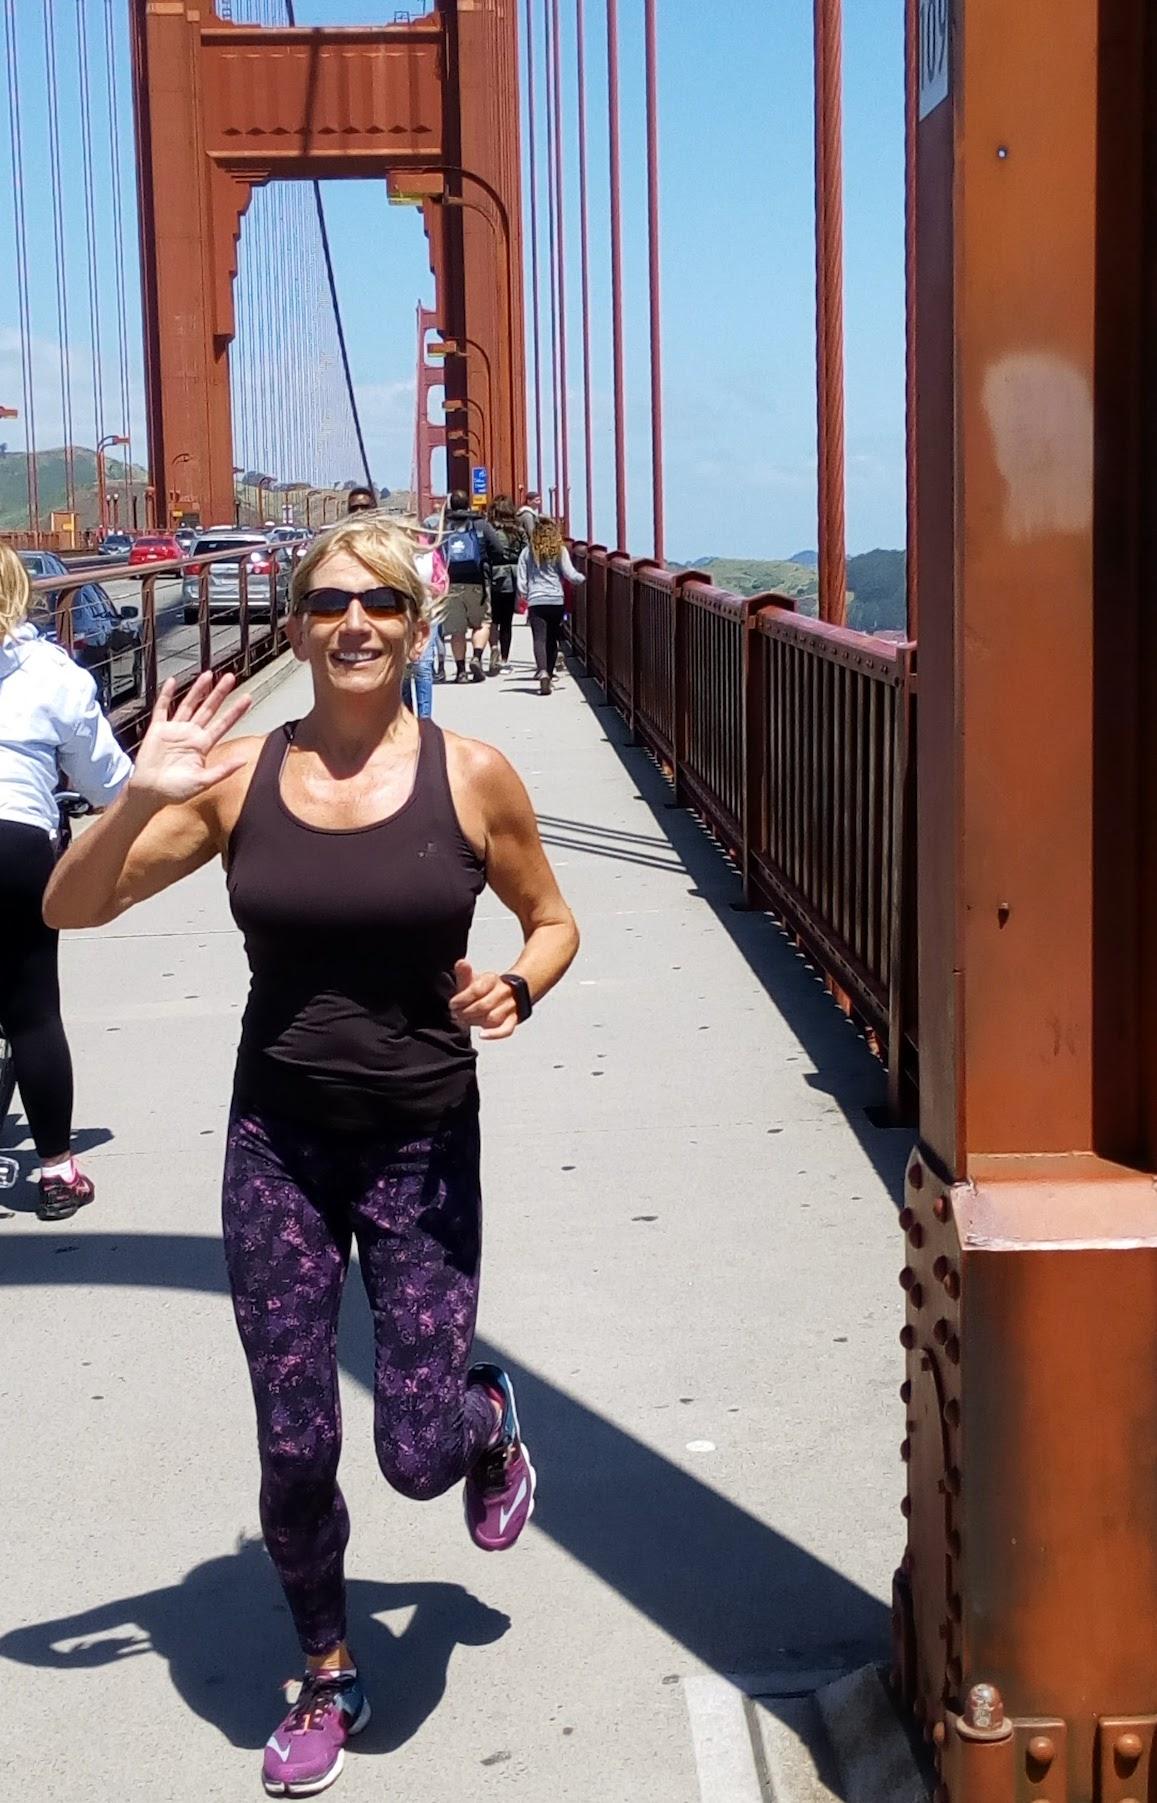 San Francisco Bay Area - running over the bridge